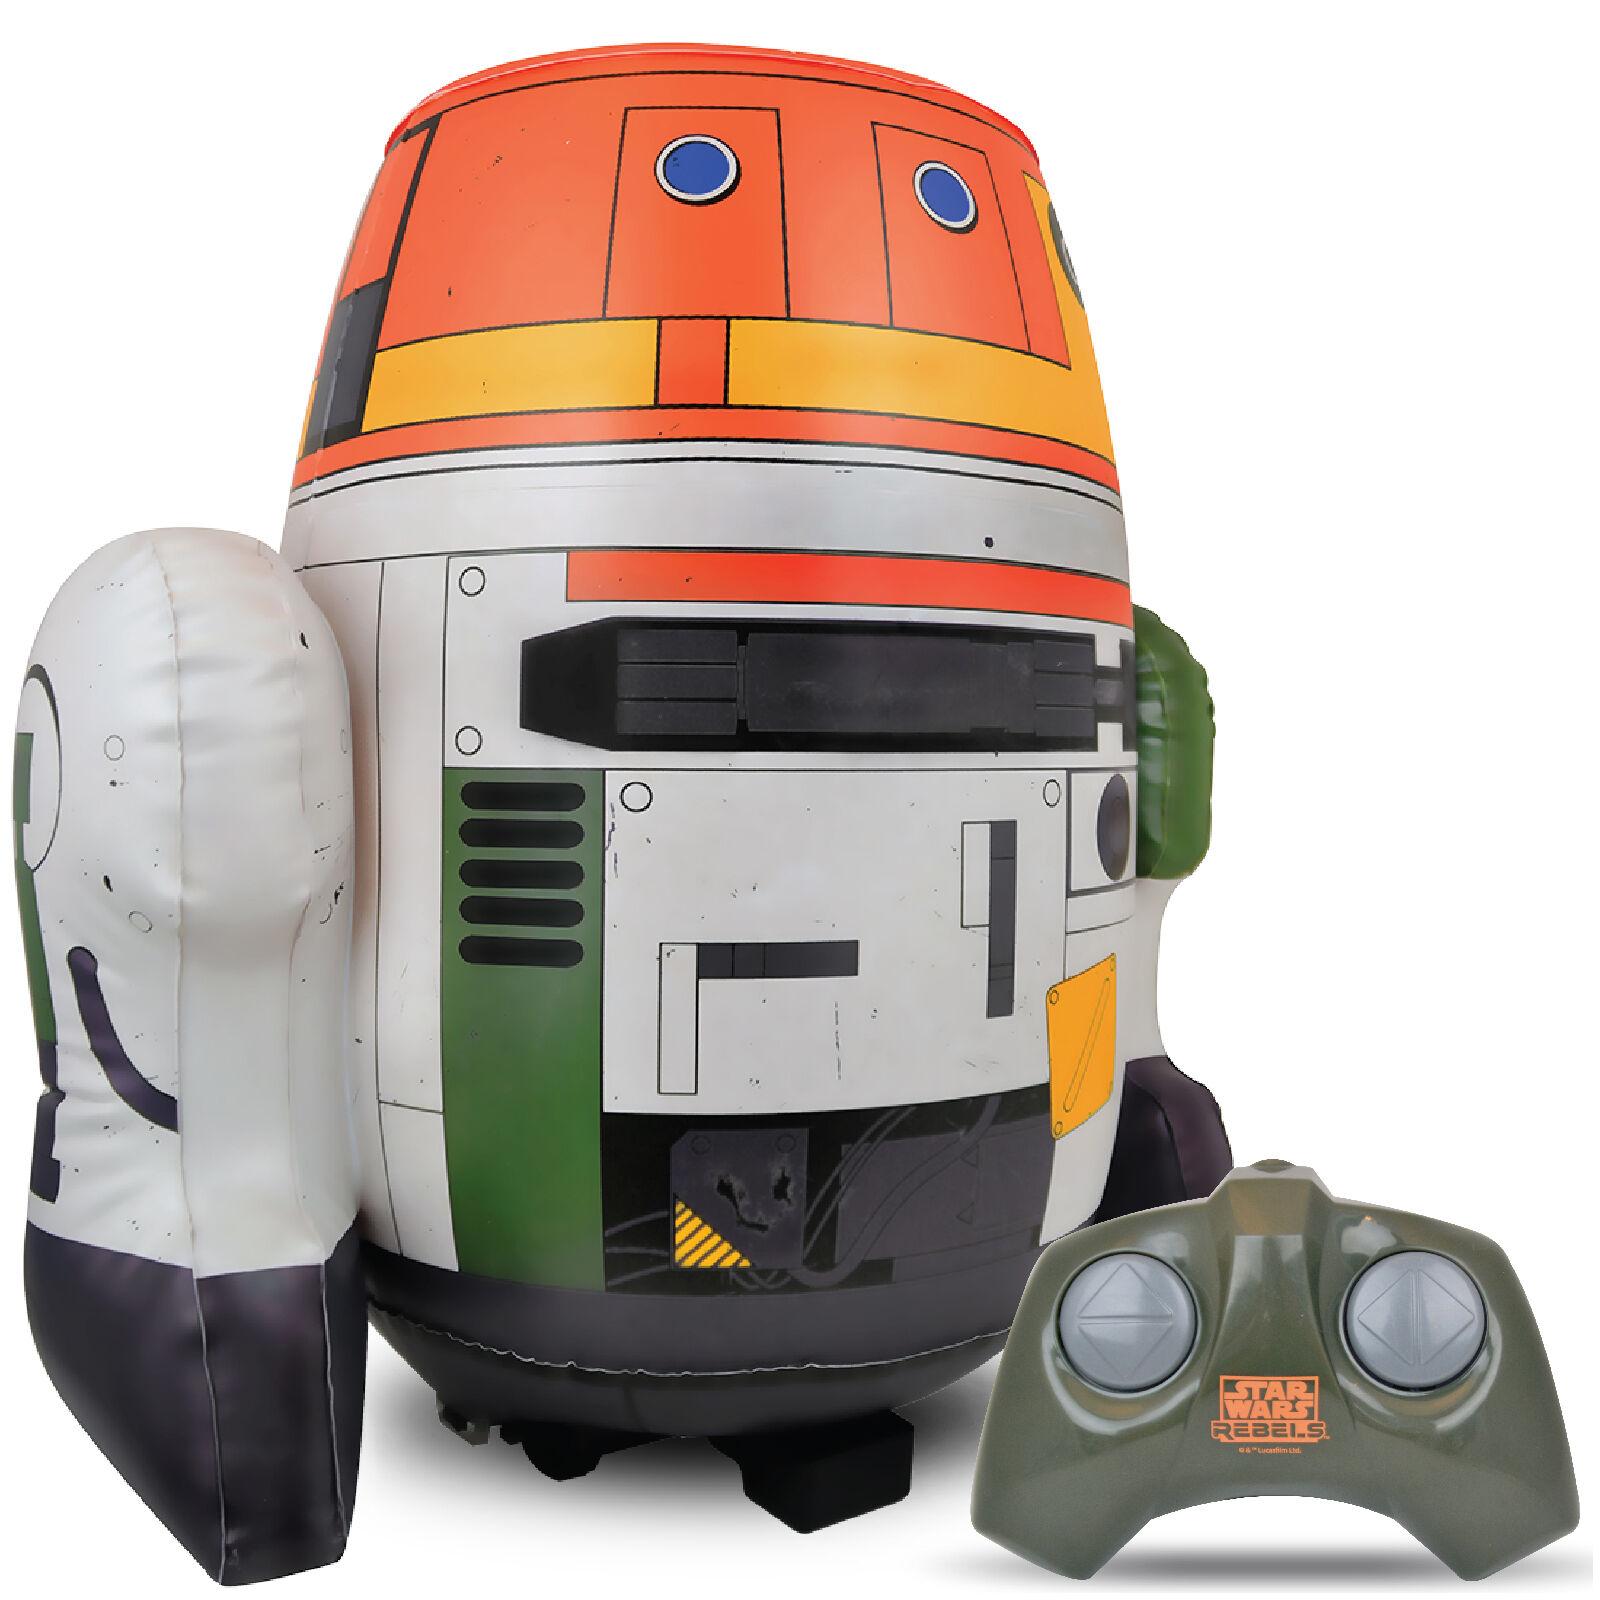 Bladez Toyz Star Wars Radio Control Jumbo Inflatable - Chopper